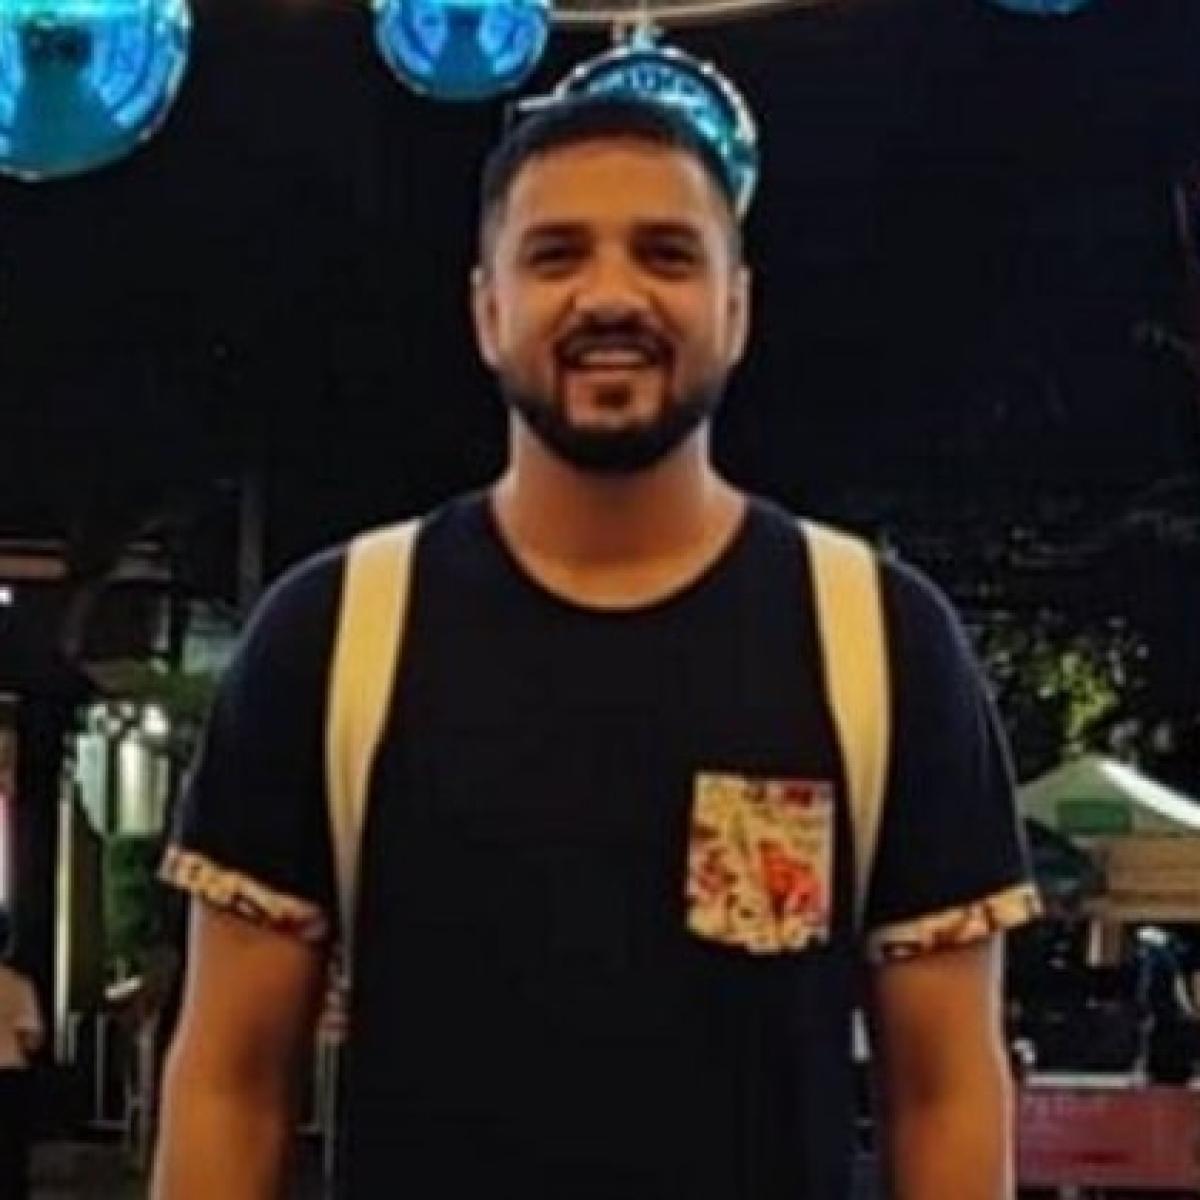 Bollywood-drugs case: NCB opposes Kshitij Prasad's bail plea